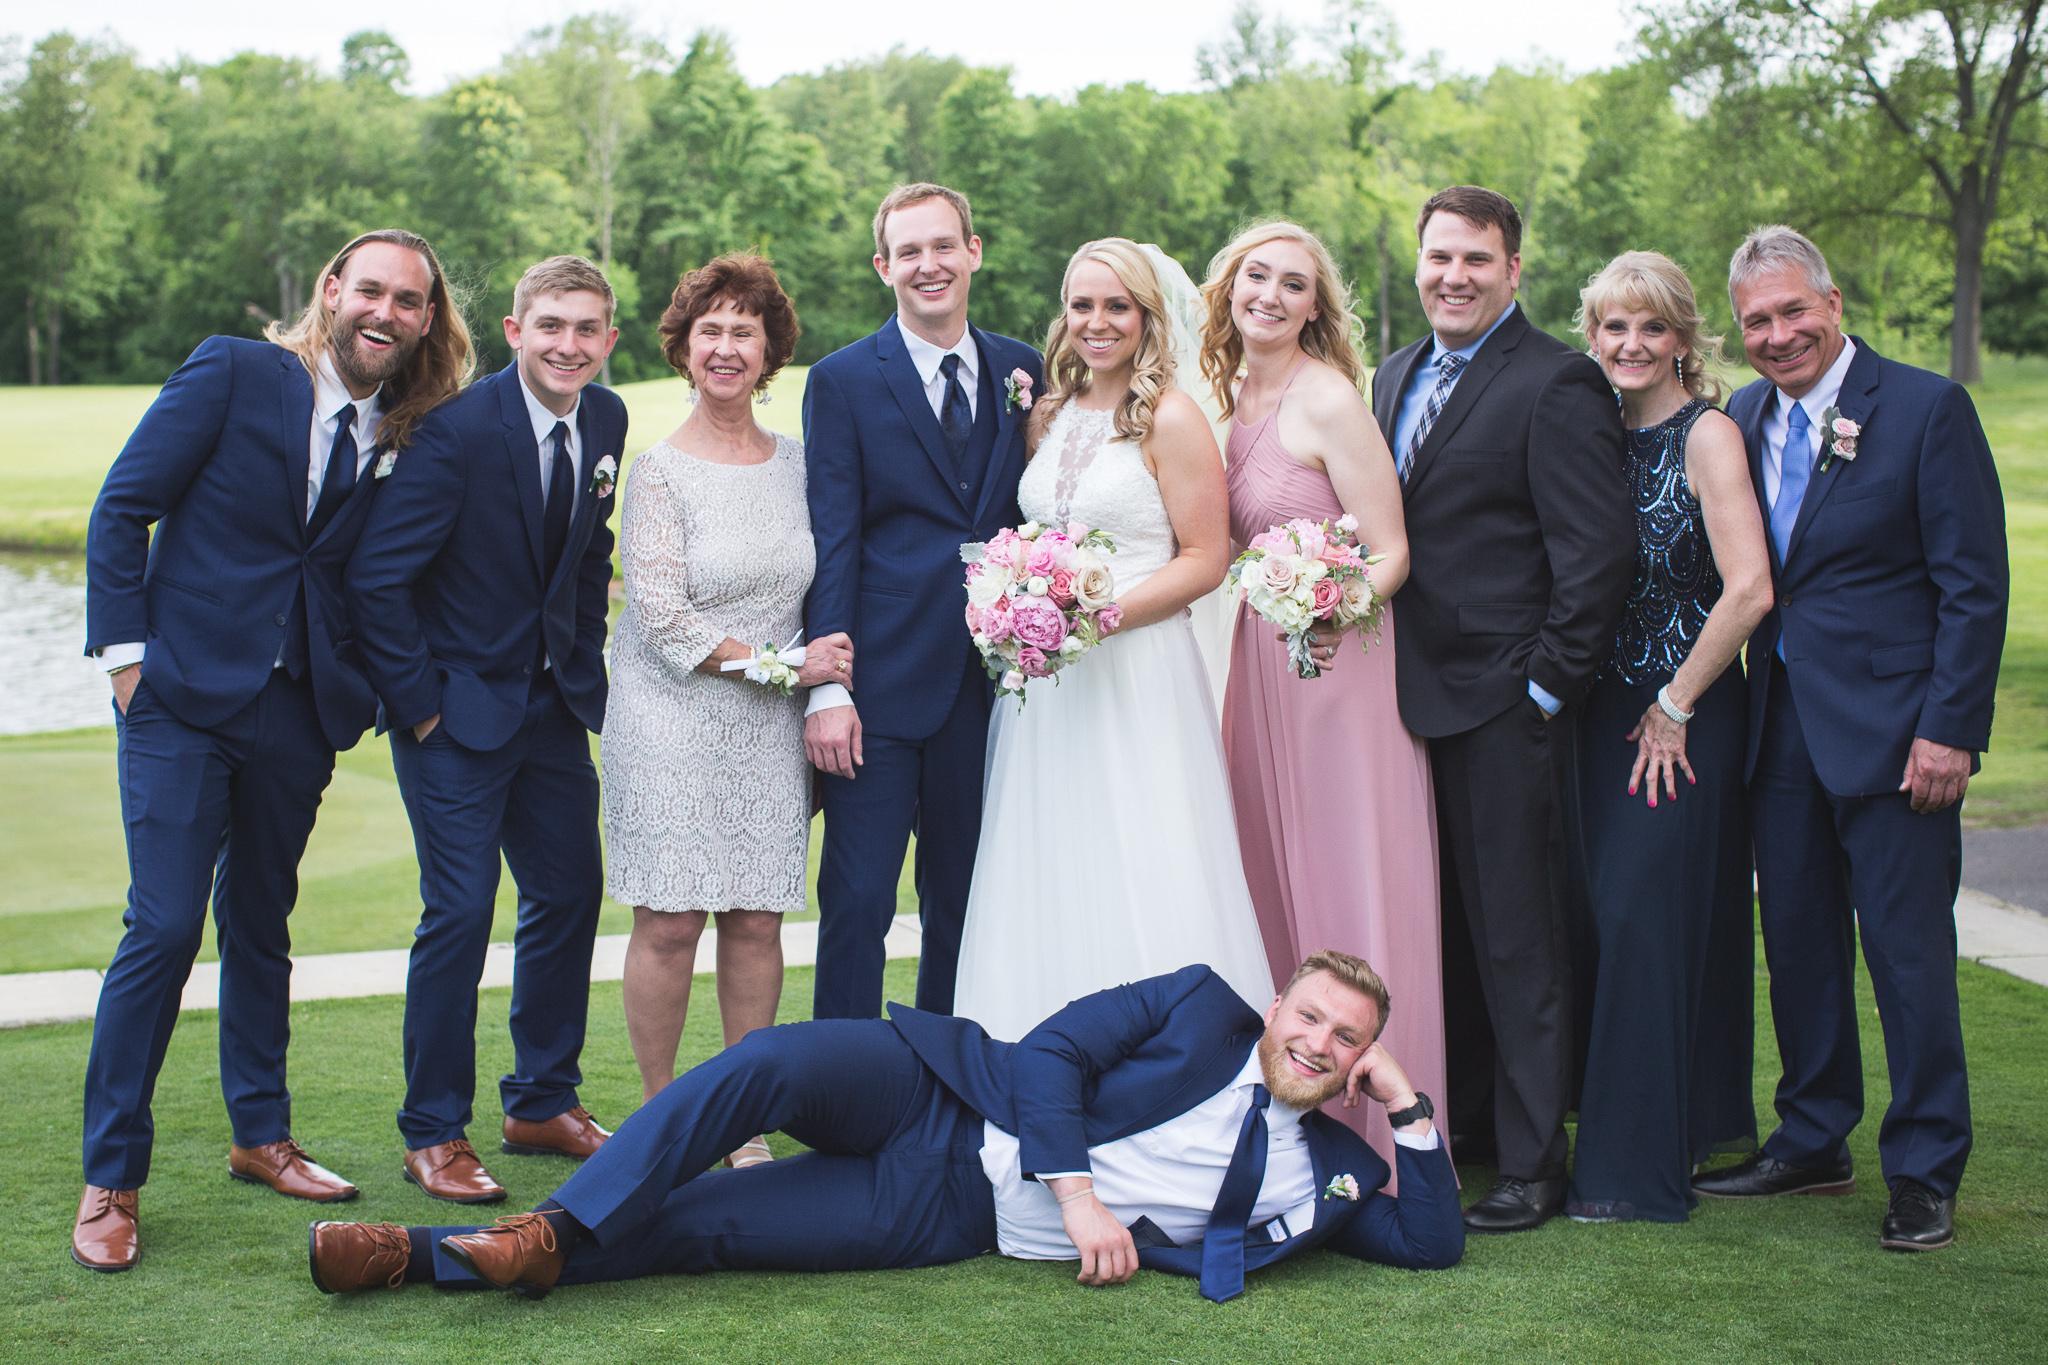 109-best-detroit-michigan-outdoor-wedding-photographer.jpg